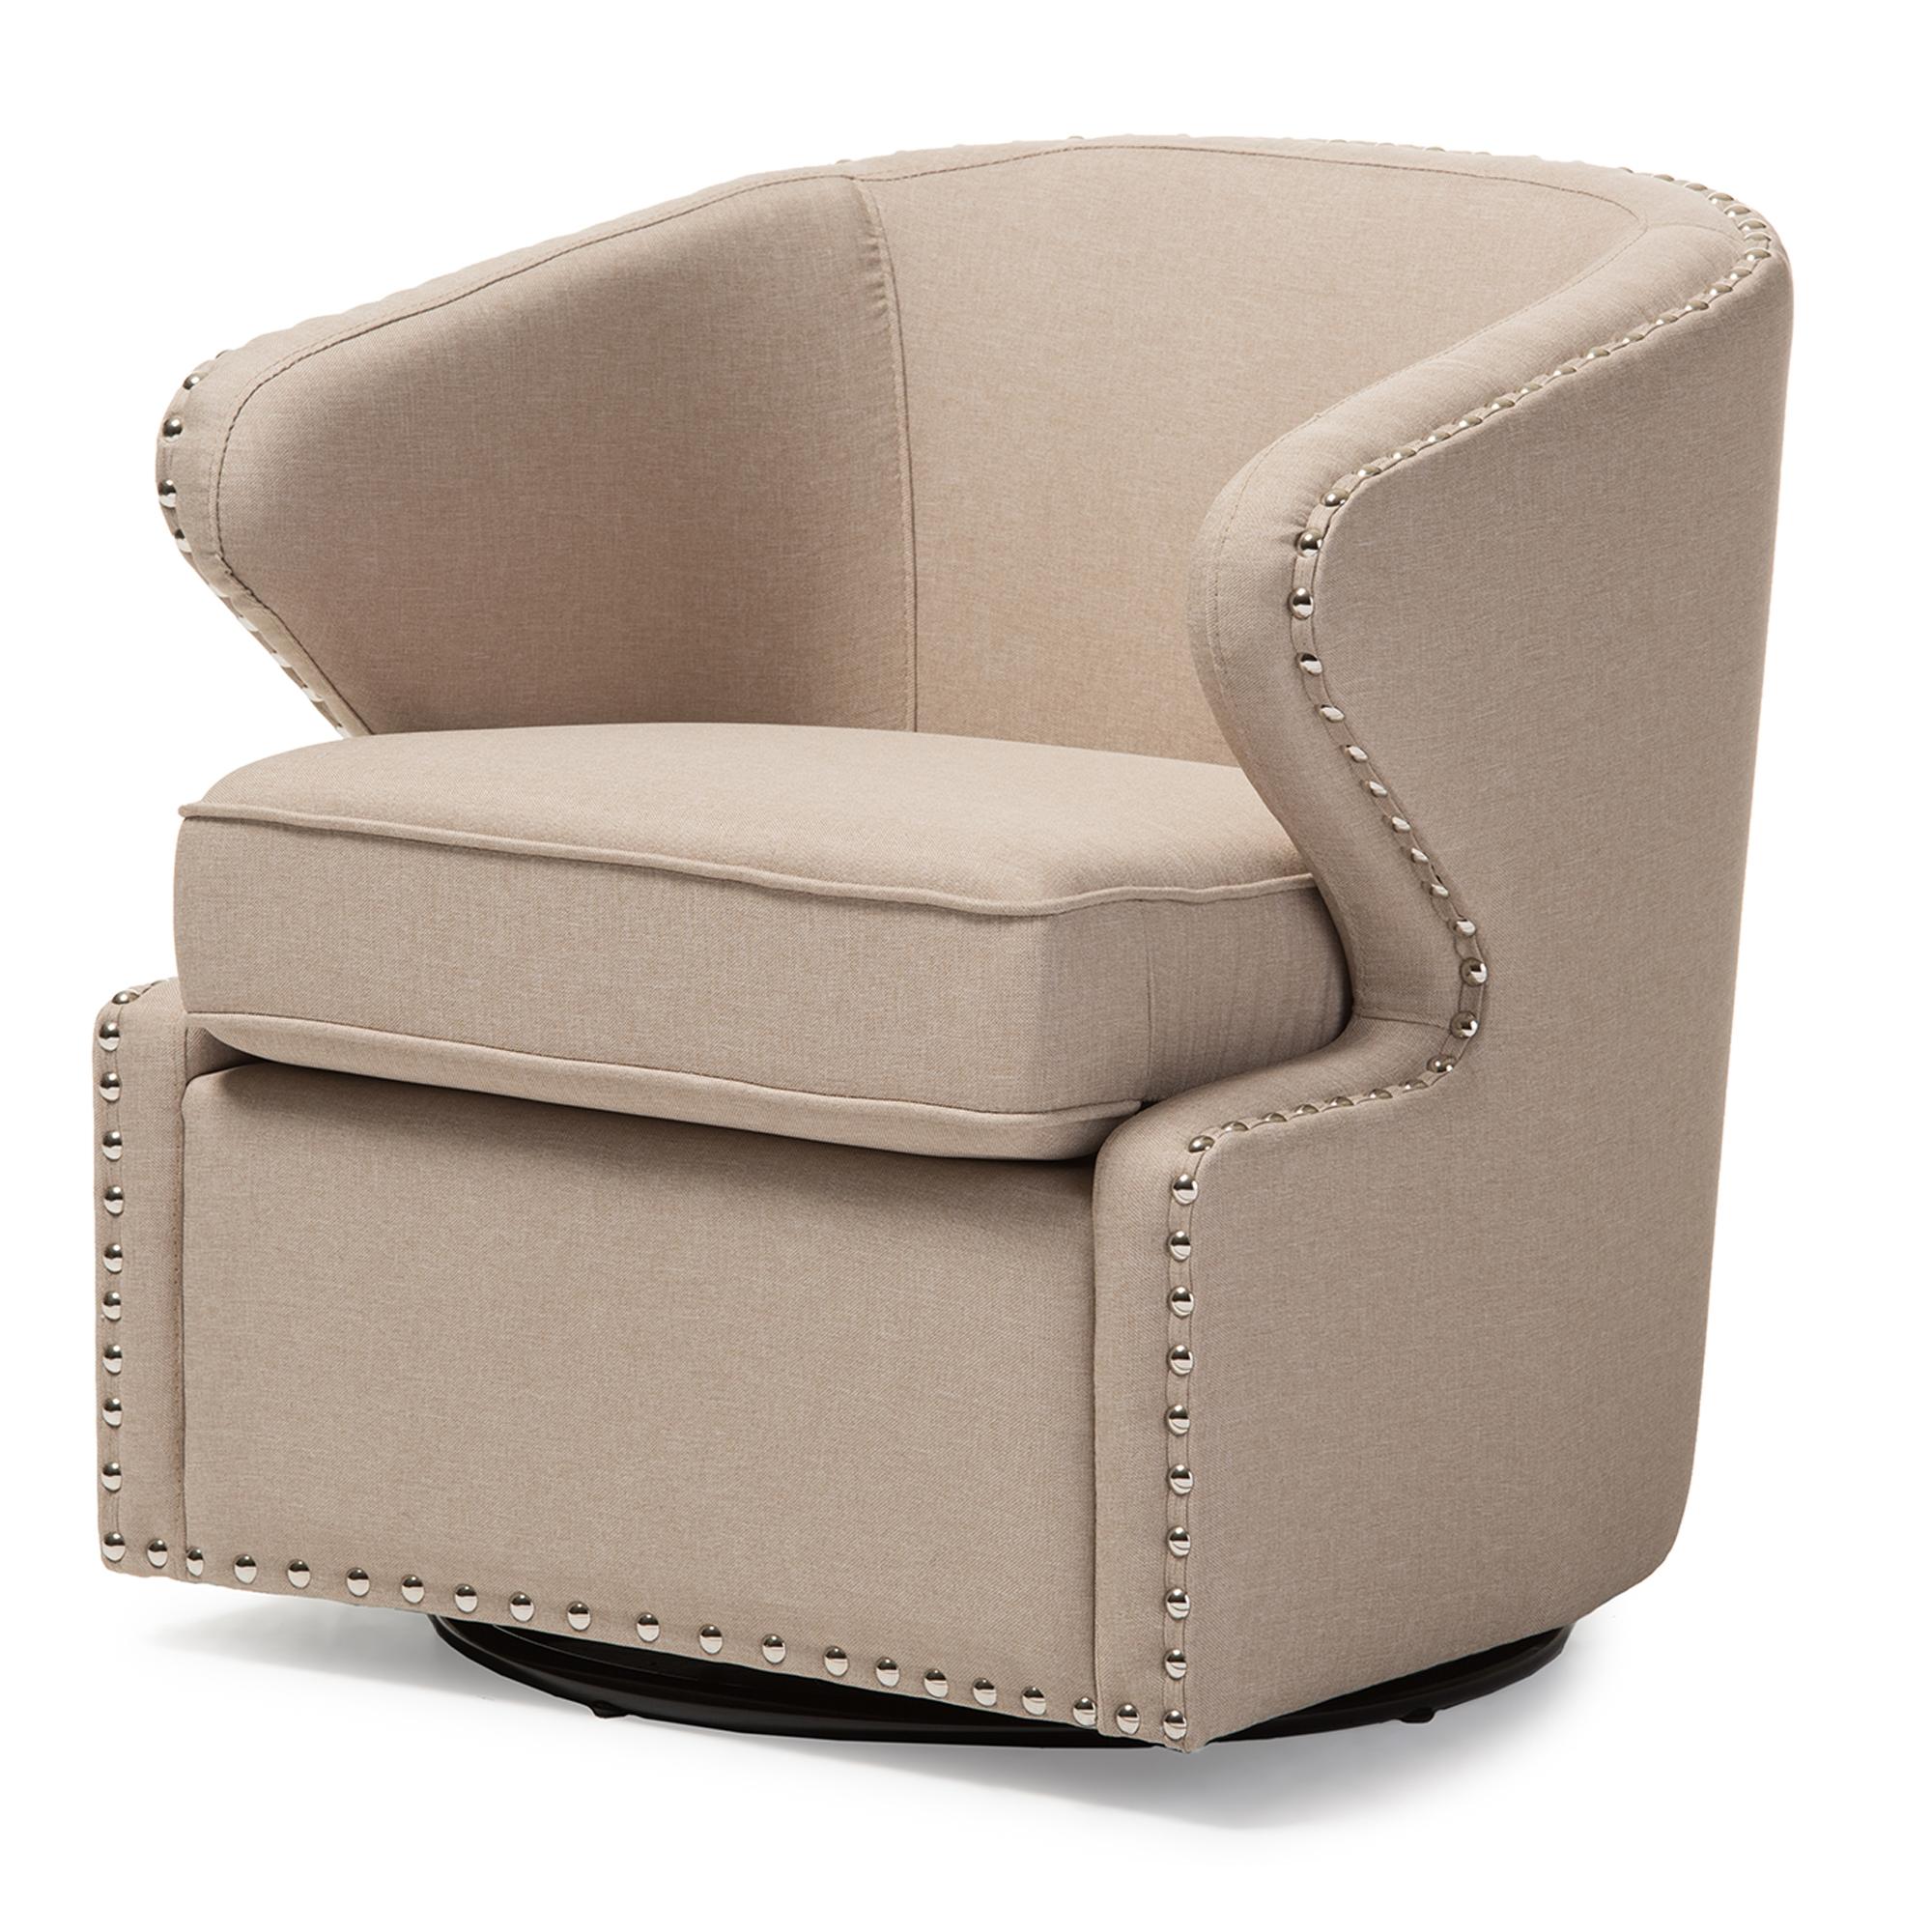 ... Baxton Studio Finley Mid Century Modern Beige Fabric Upholstered Swivel  Armchair   IEDB 203 ...